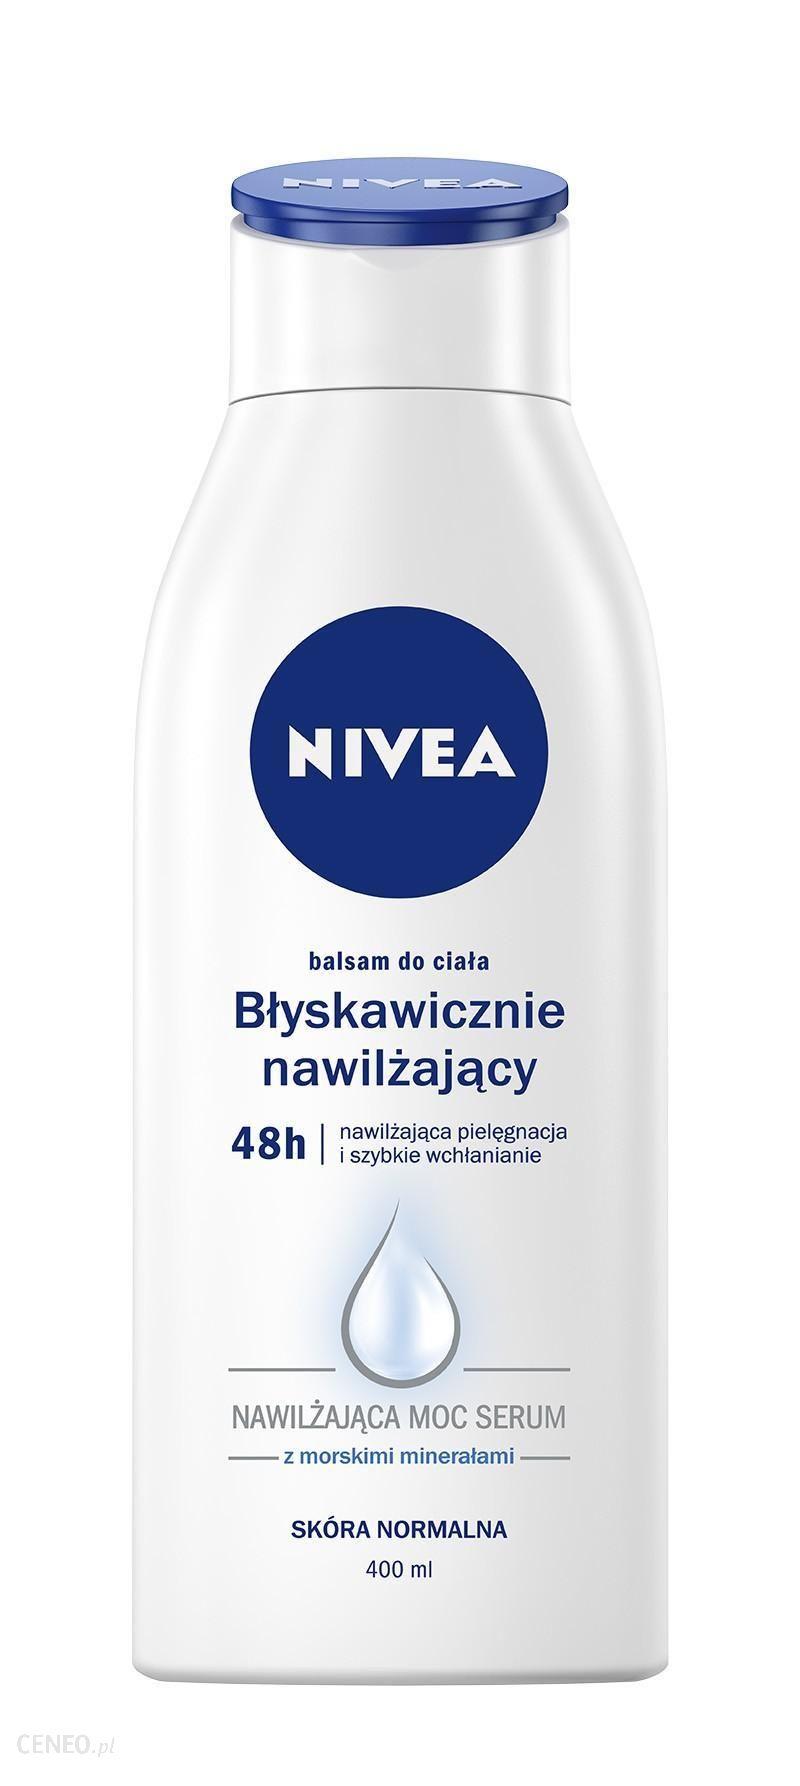 Nivea Body Balsam Do Ciała Express Hydration Błysk